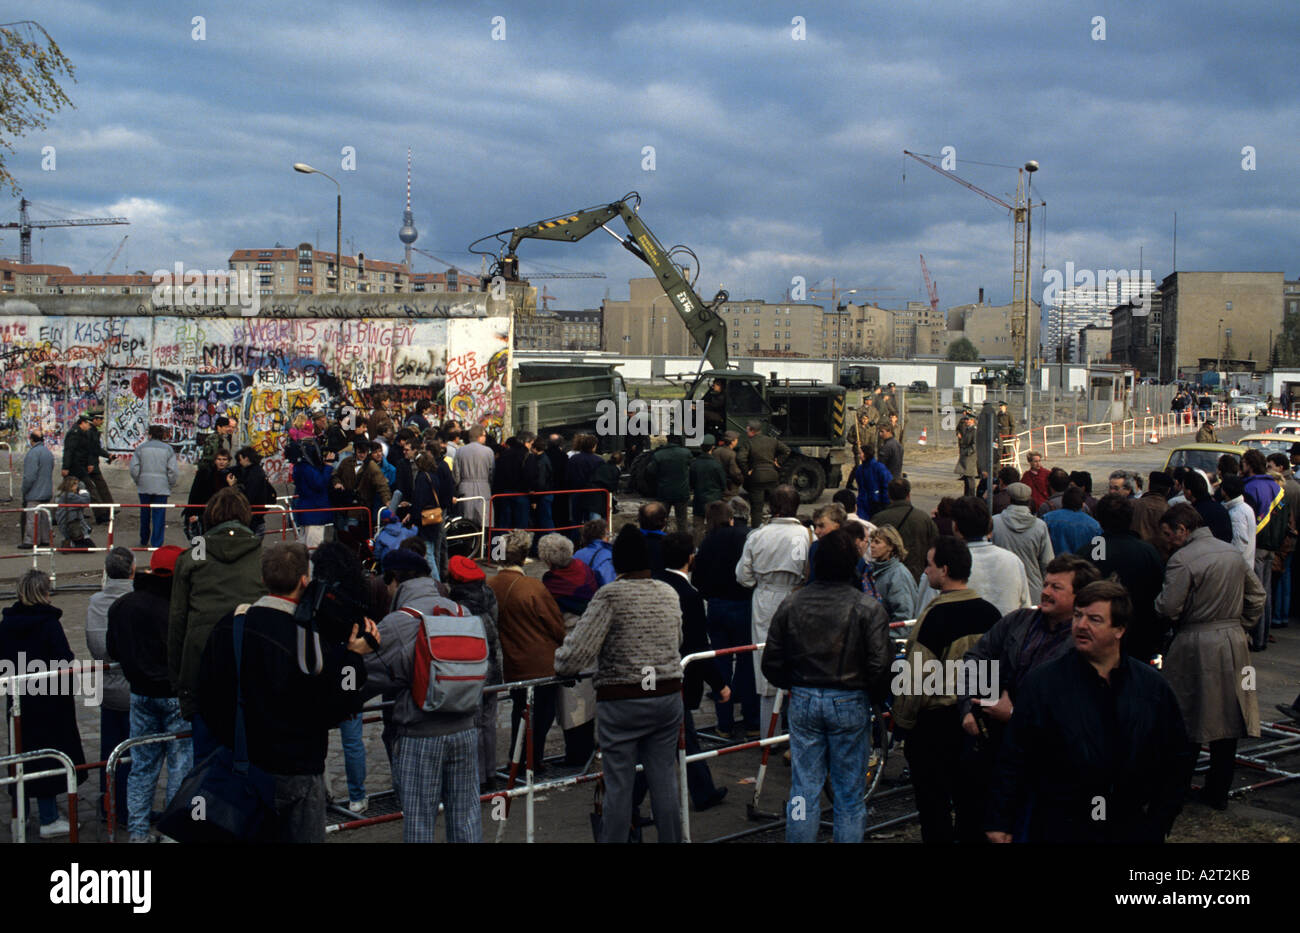 Europa Deutschland Germania Berlino Mauerfall 1989 caduta del muro Potsdamer Platz Immagini Stock